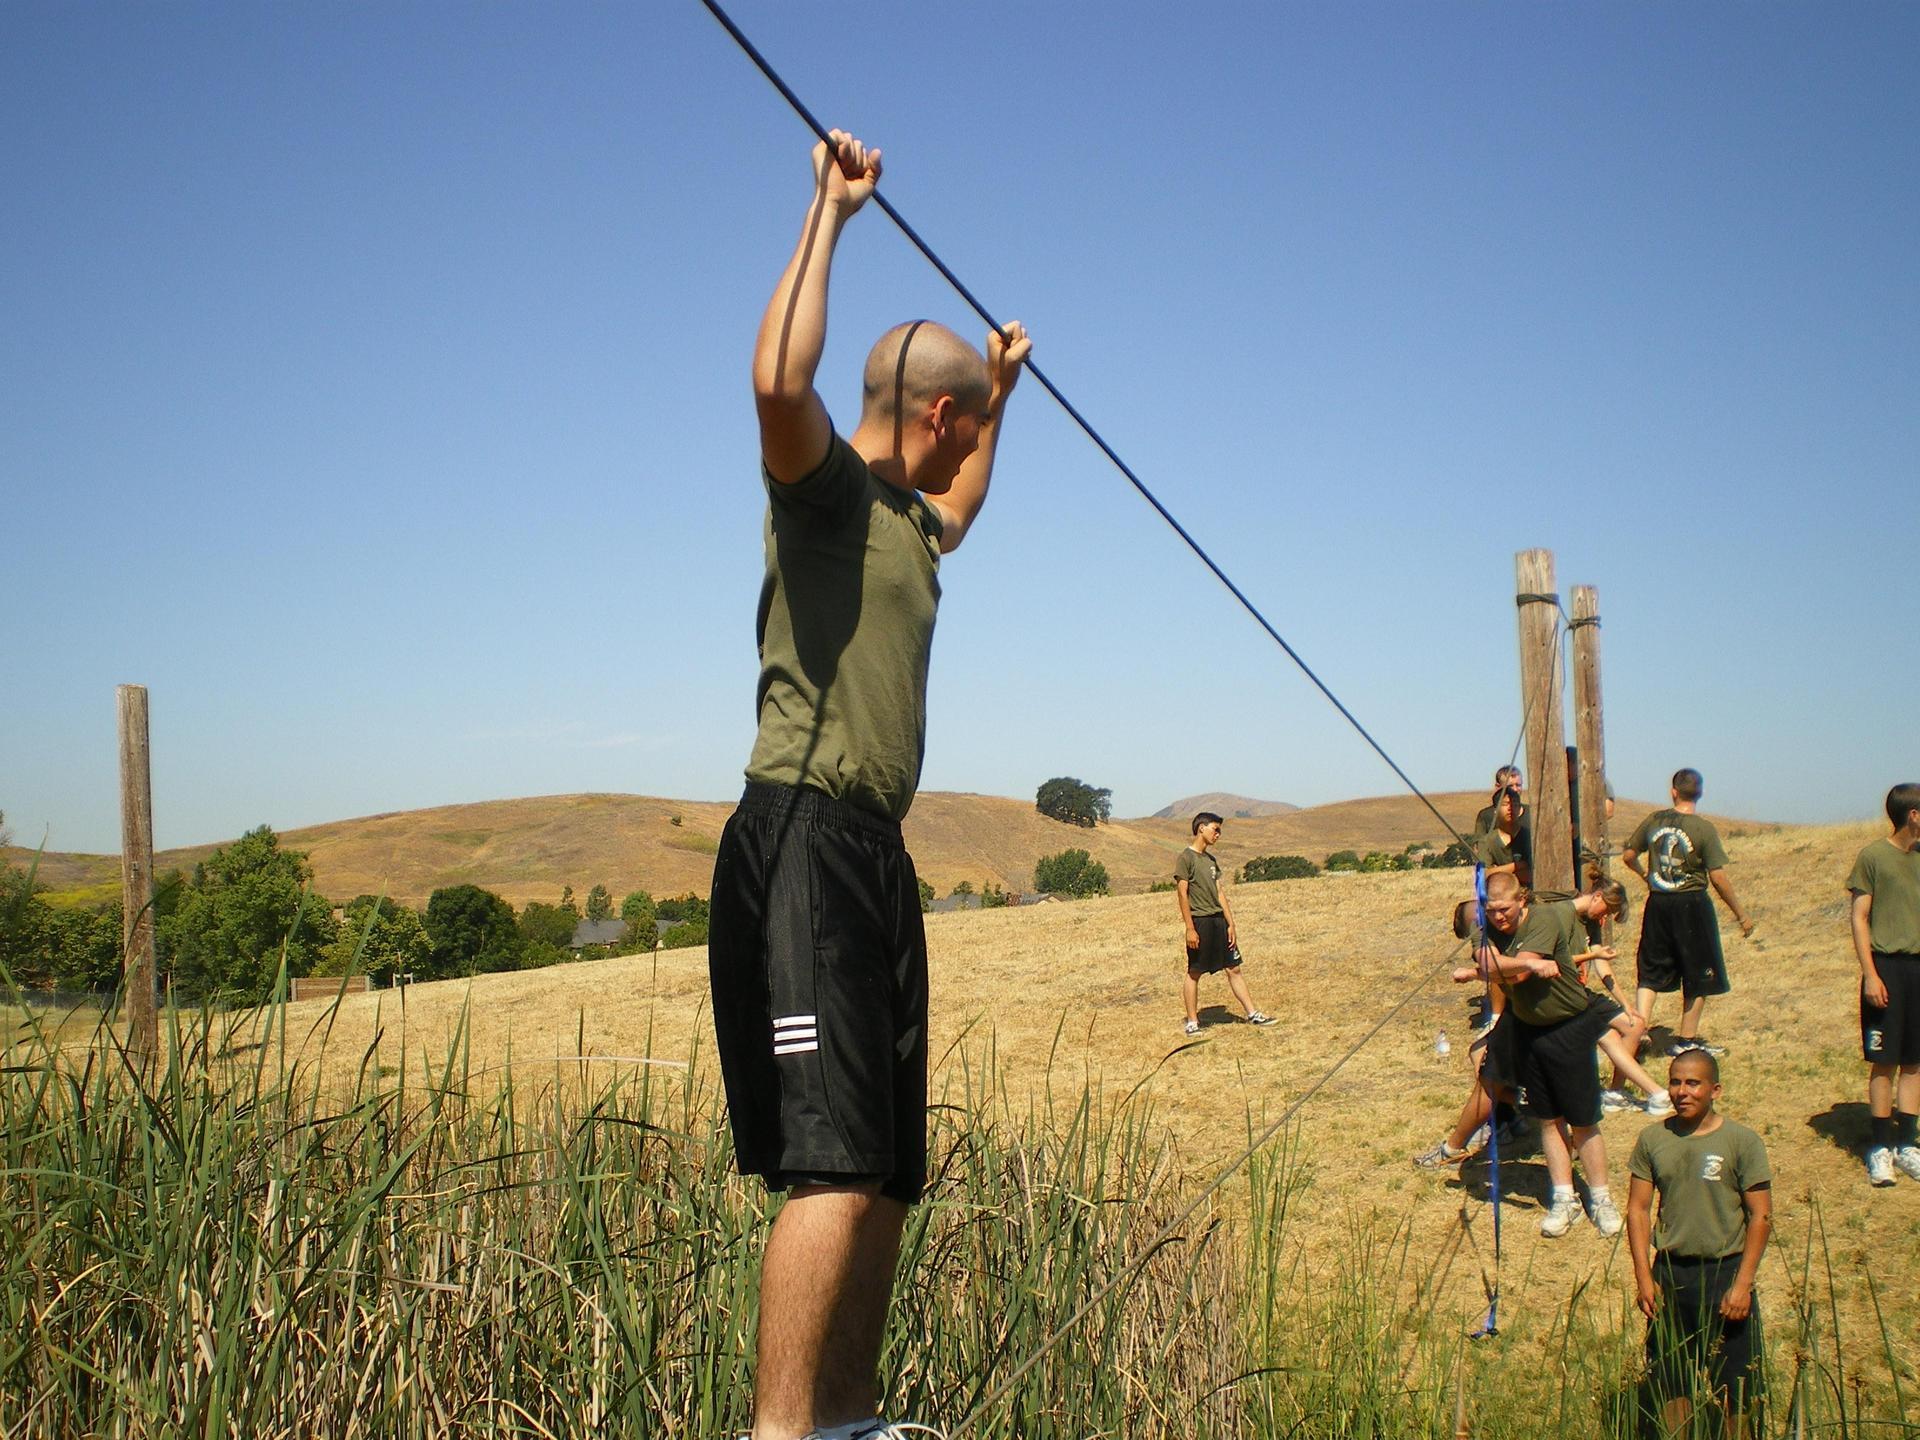 MCJROTC cadets doing teamwork activities